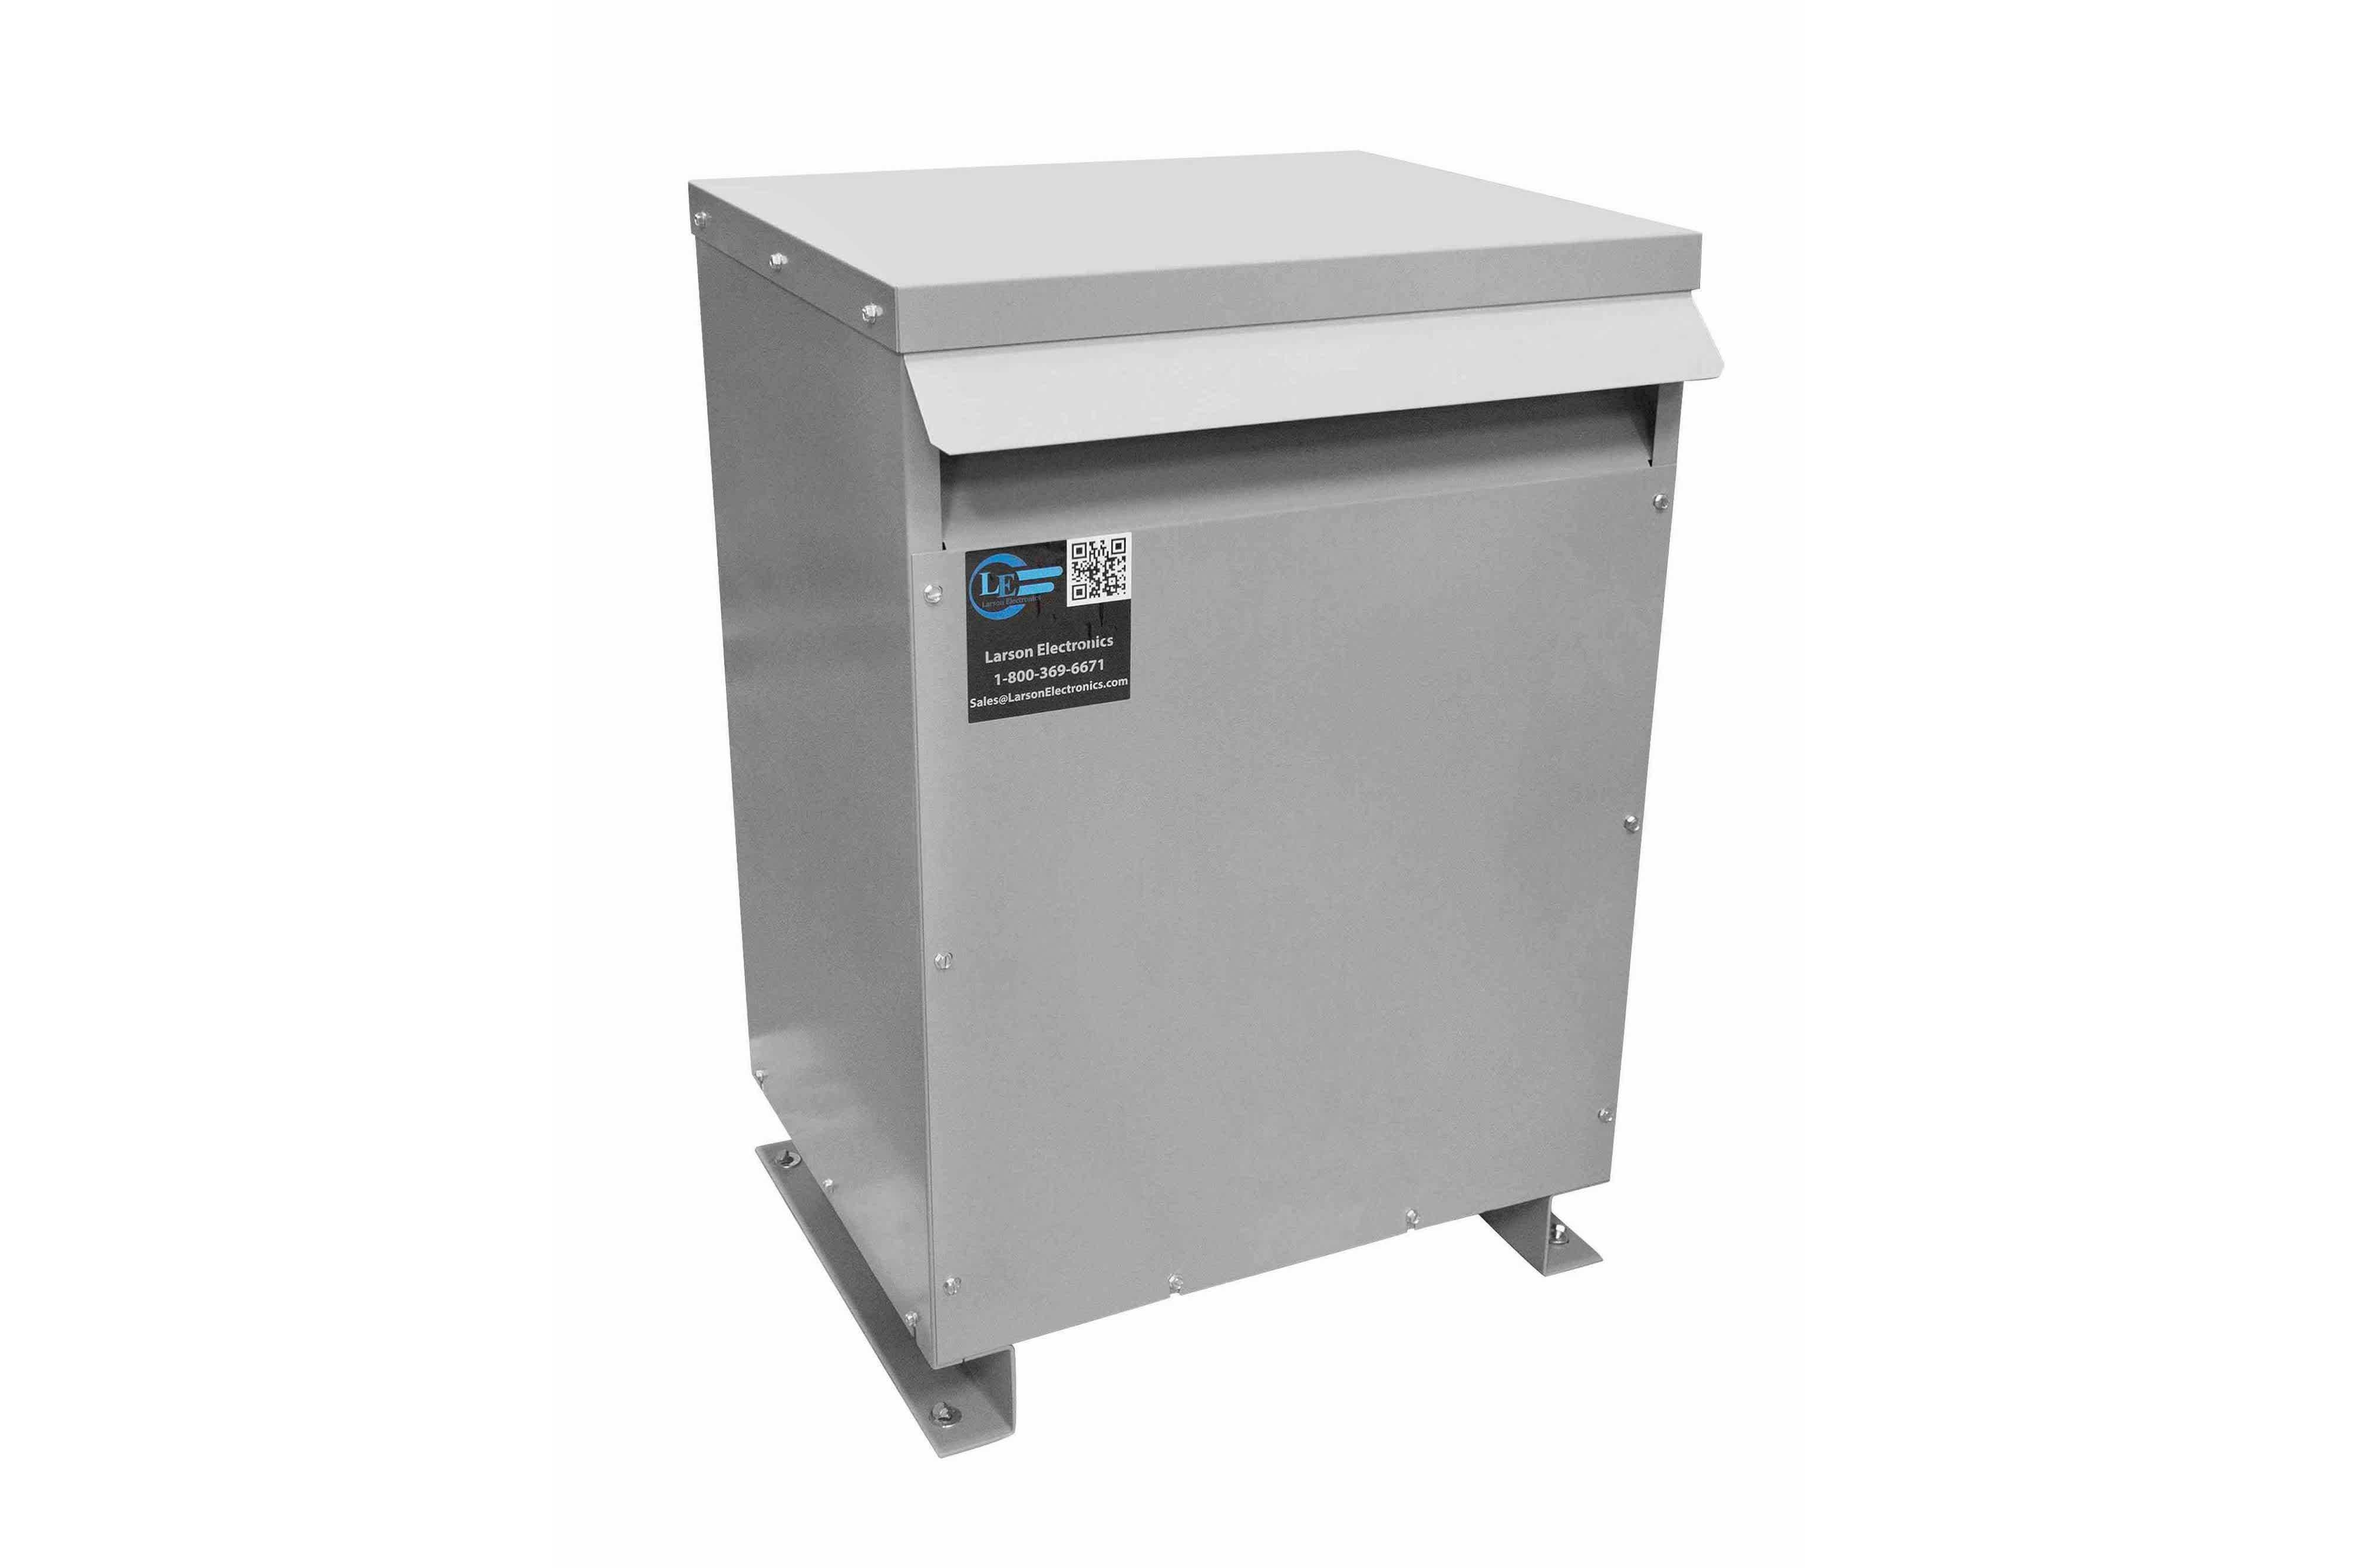 65 kVA 3PH Isolation Transformer, 600V Wye Primary, 480Y/277 Wye-N Secondary, N3R, Ventilated, 60 Hz